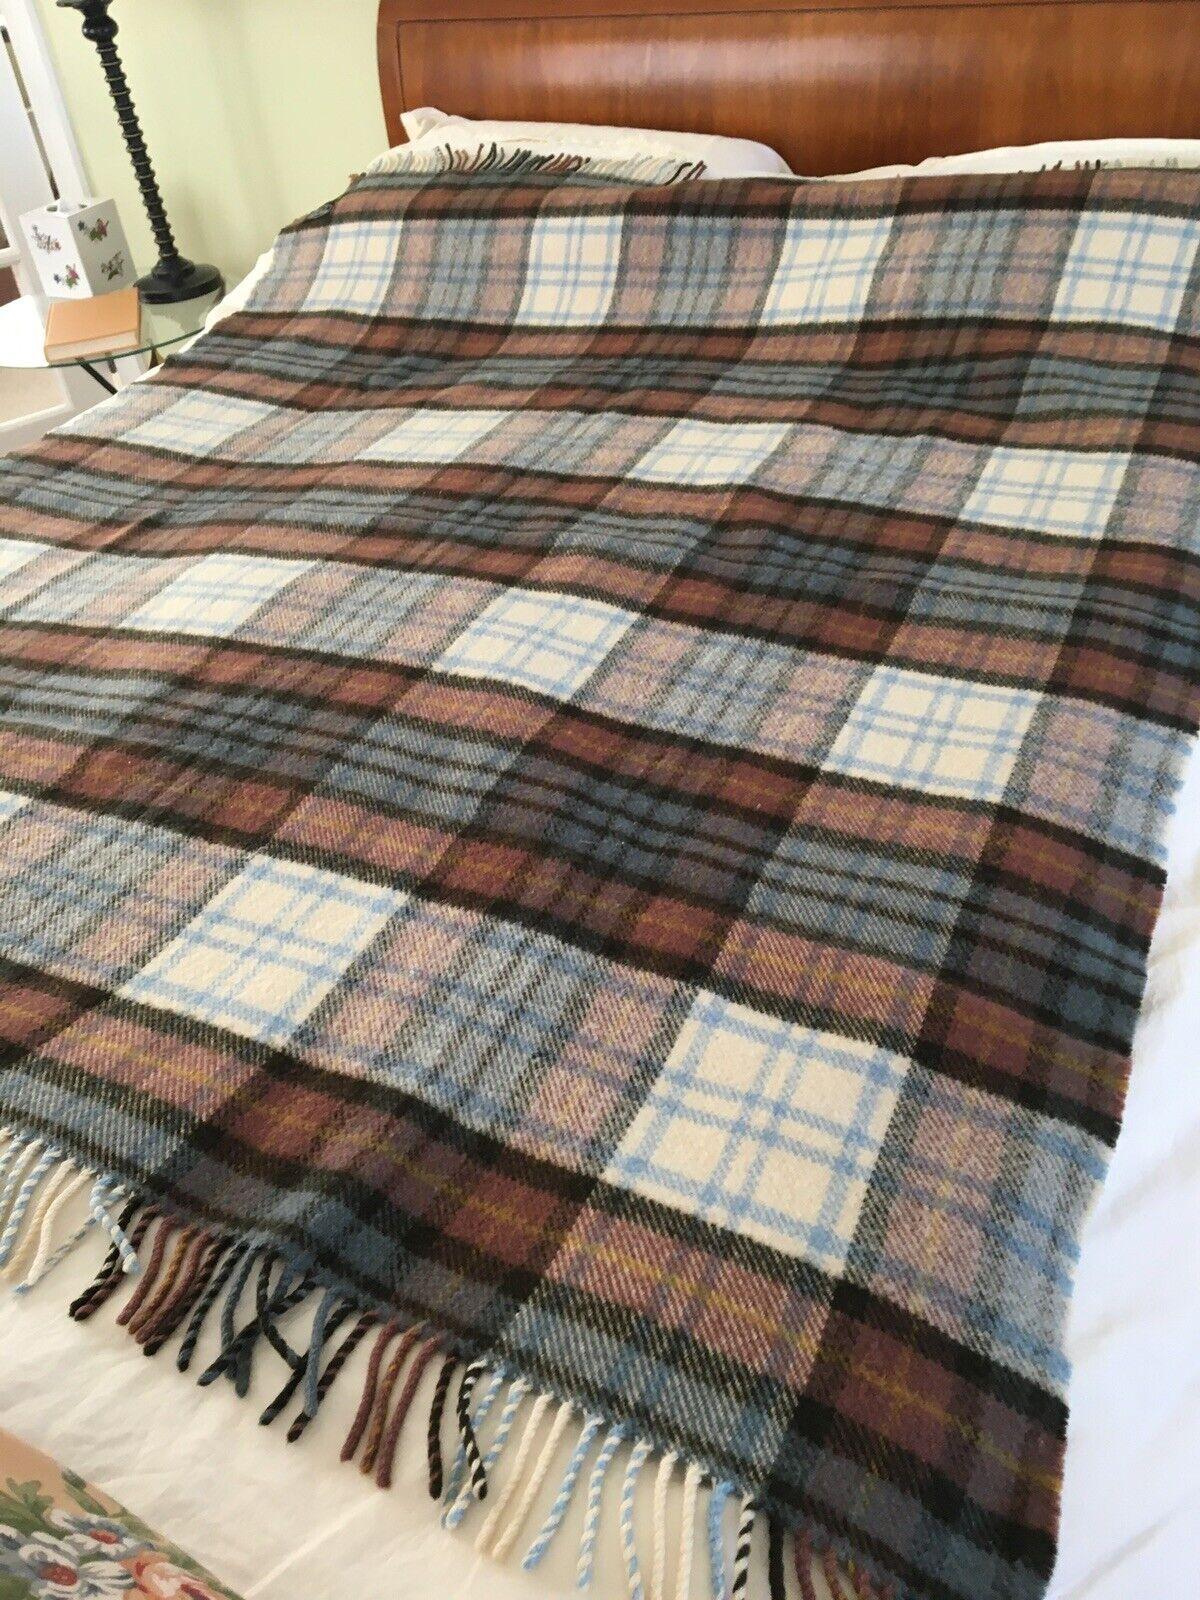 Plaid Quilt Tartan Quilt Tartan Blanket Plaid Blanket Plaid Throw Tartan Throw Made in Scotland Scottish Gift